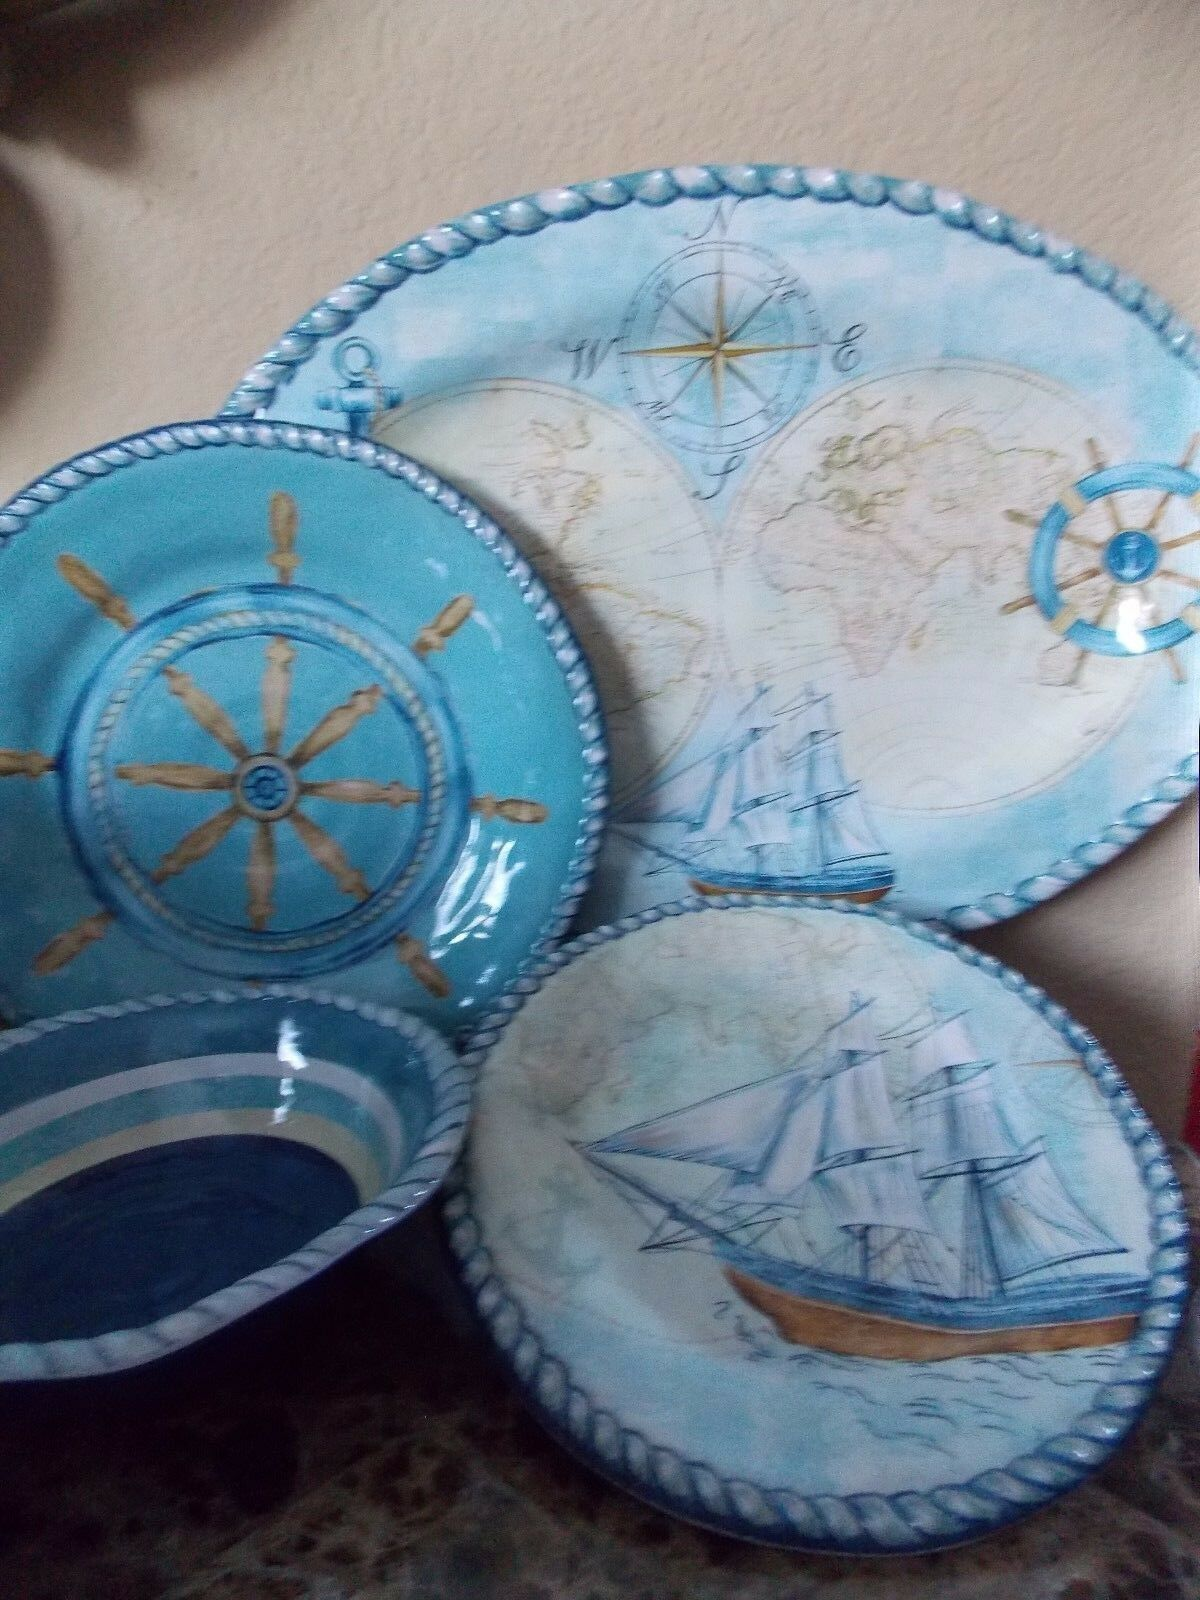 NEW NAUTICAL SAILBOATS ANCHOR 13 PIECE SET MELAMINE DINNER SALAD PLATES PLATTER